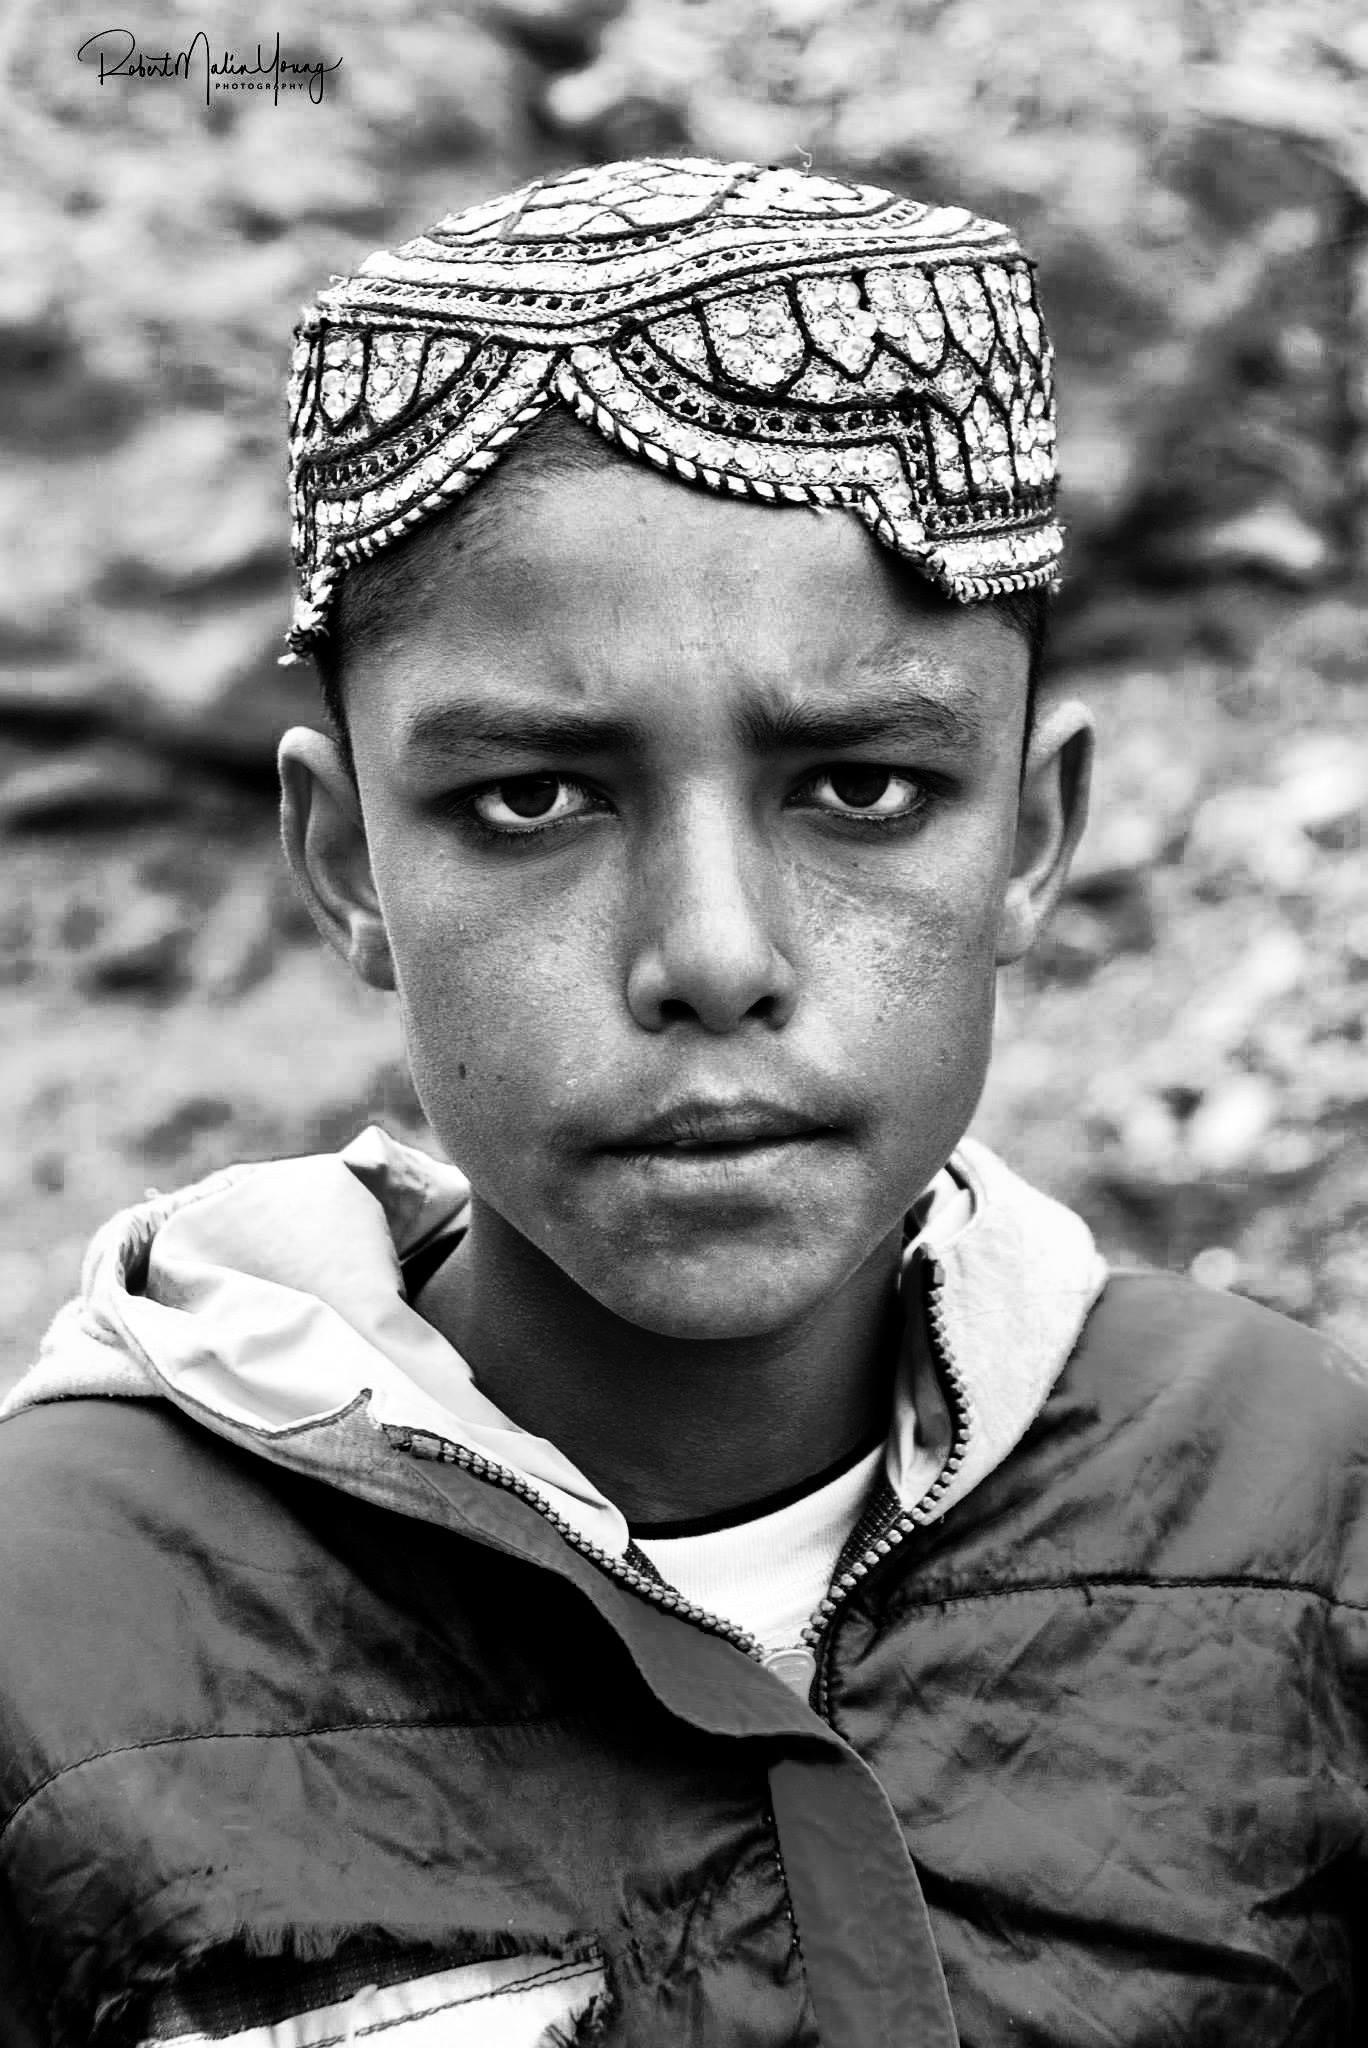 Afghan boy 2018 by Robert Malin Young